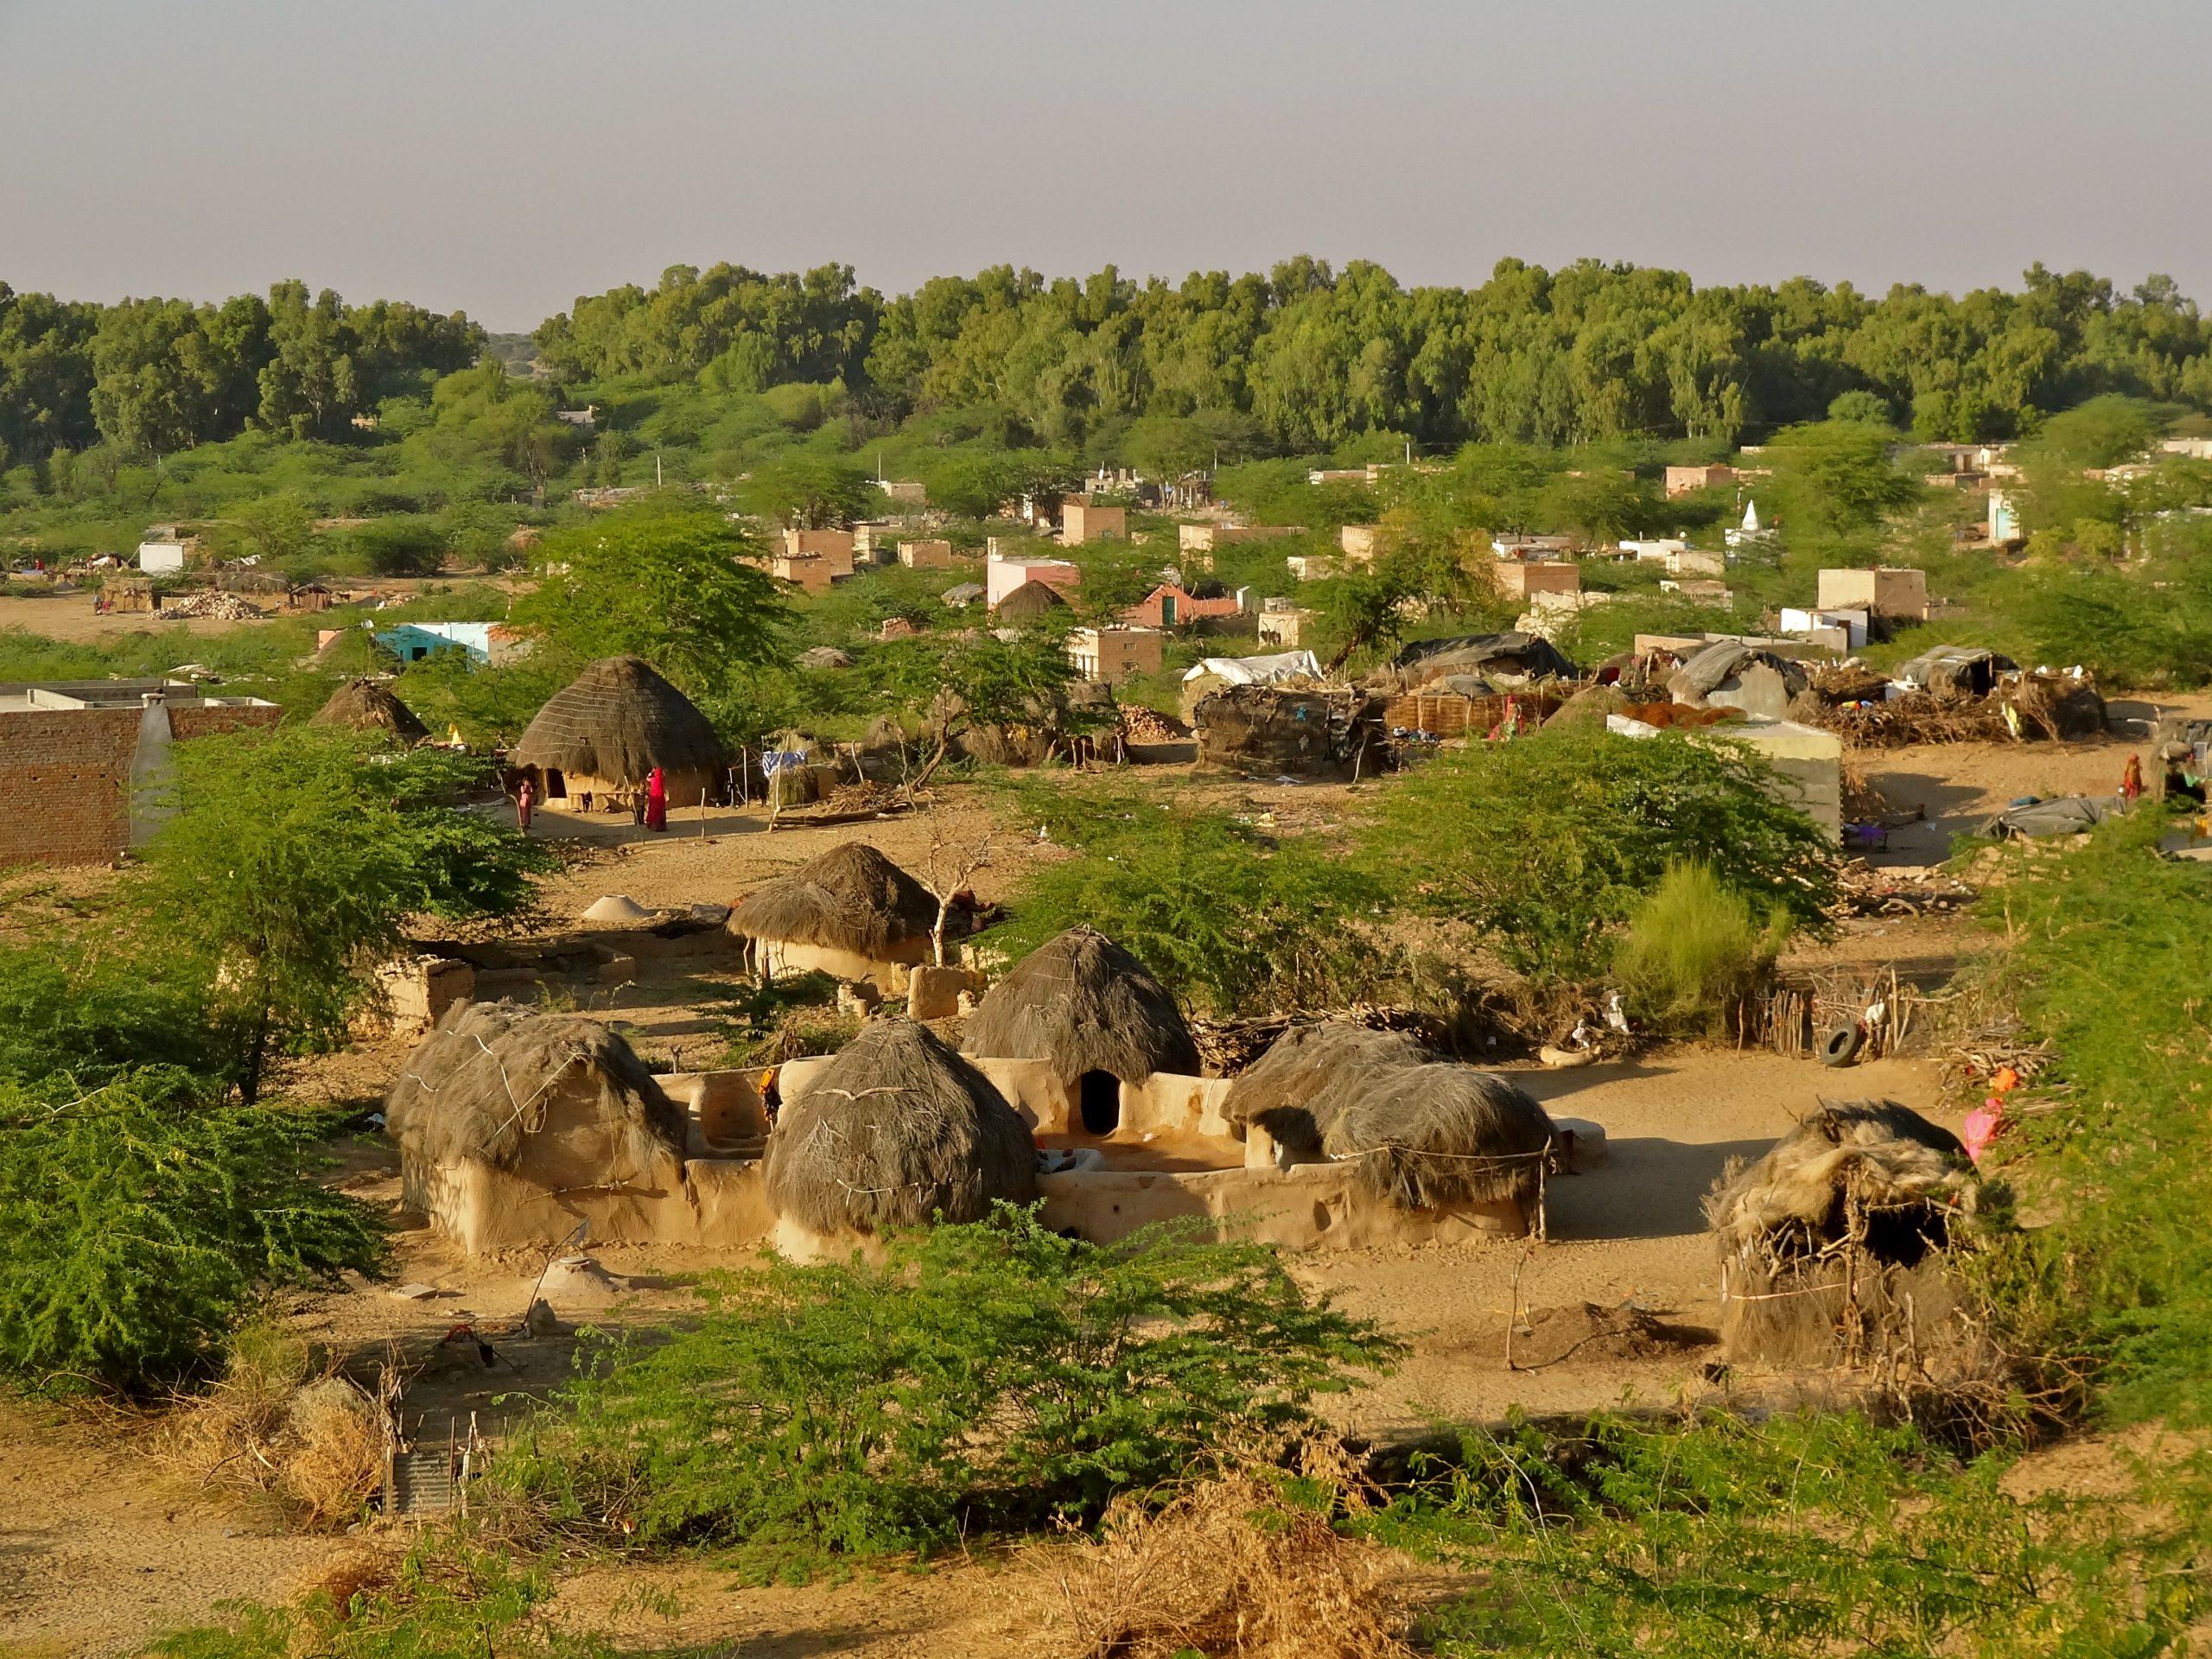 Bhap Village, Phalodi District Offbeat Destinations When Touring Rajasthan